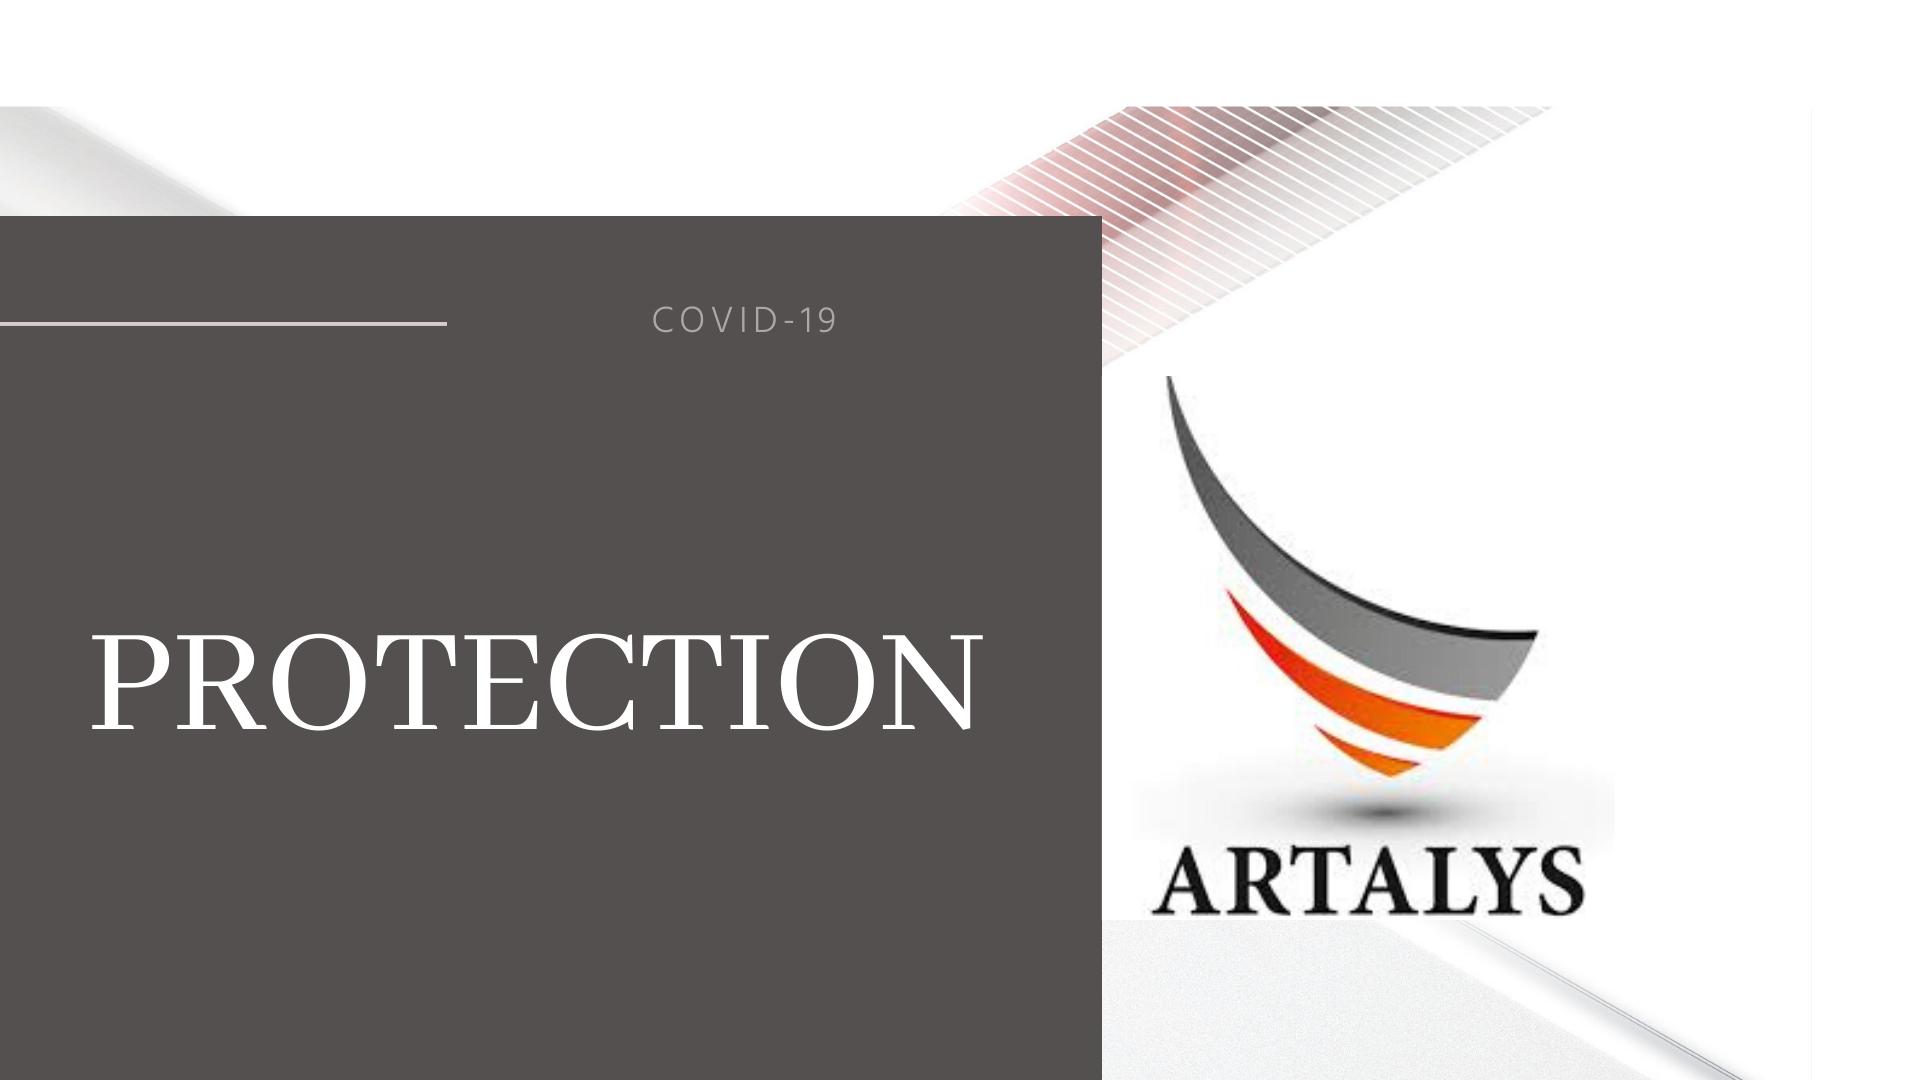 Protection covid-19 artalys